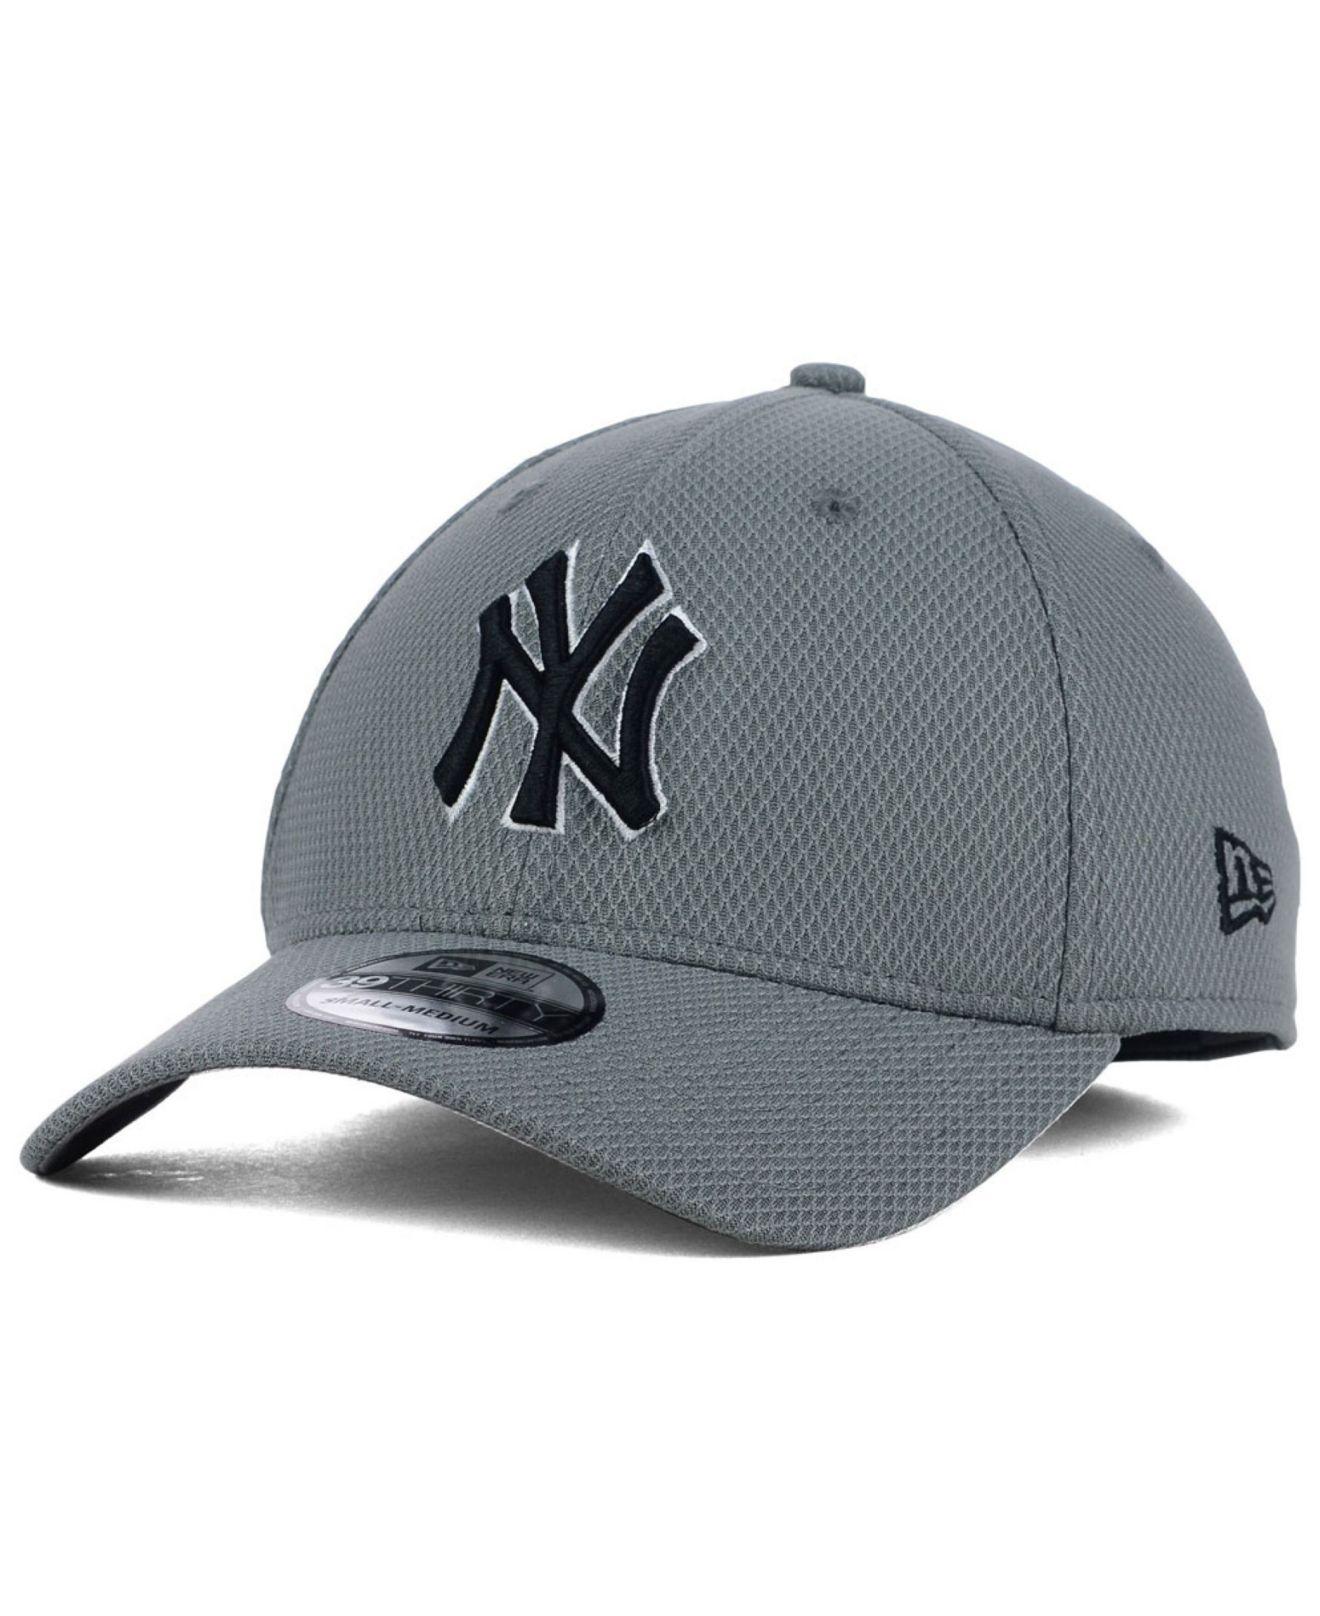 a2d0b015bec Lyst - KTZ New York Yankees Diamond Era Gray Black White 39thirty ...